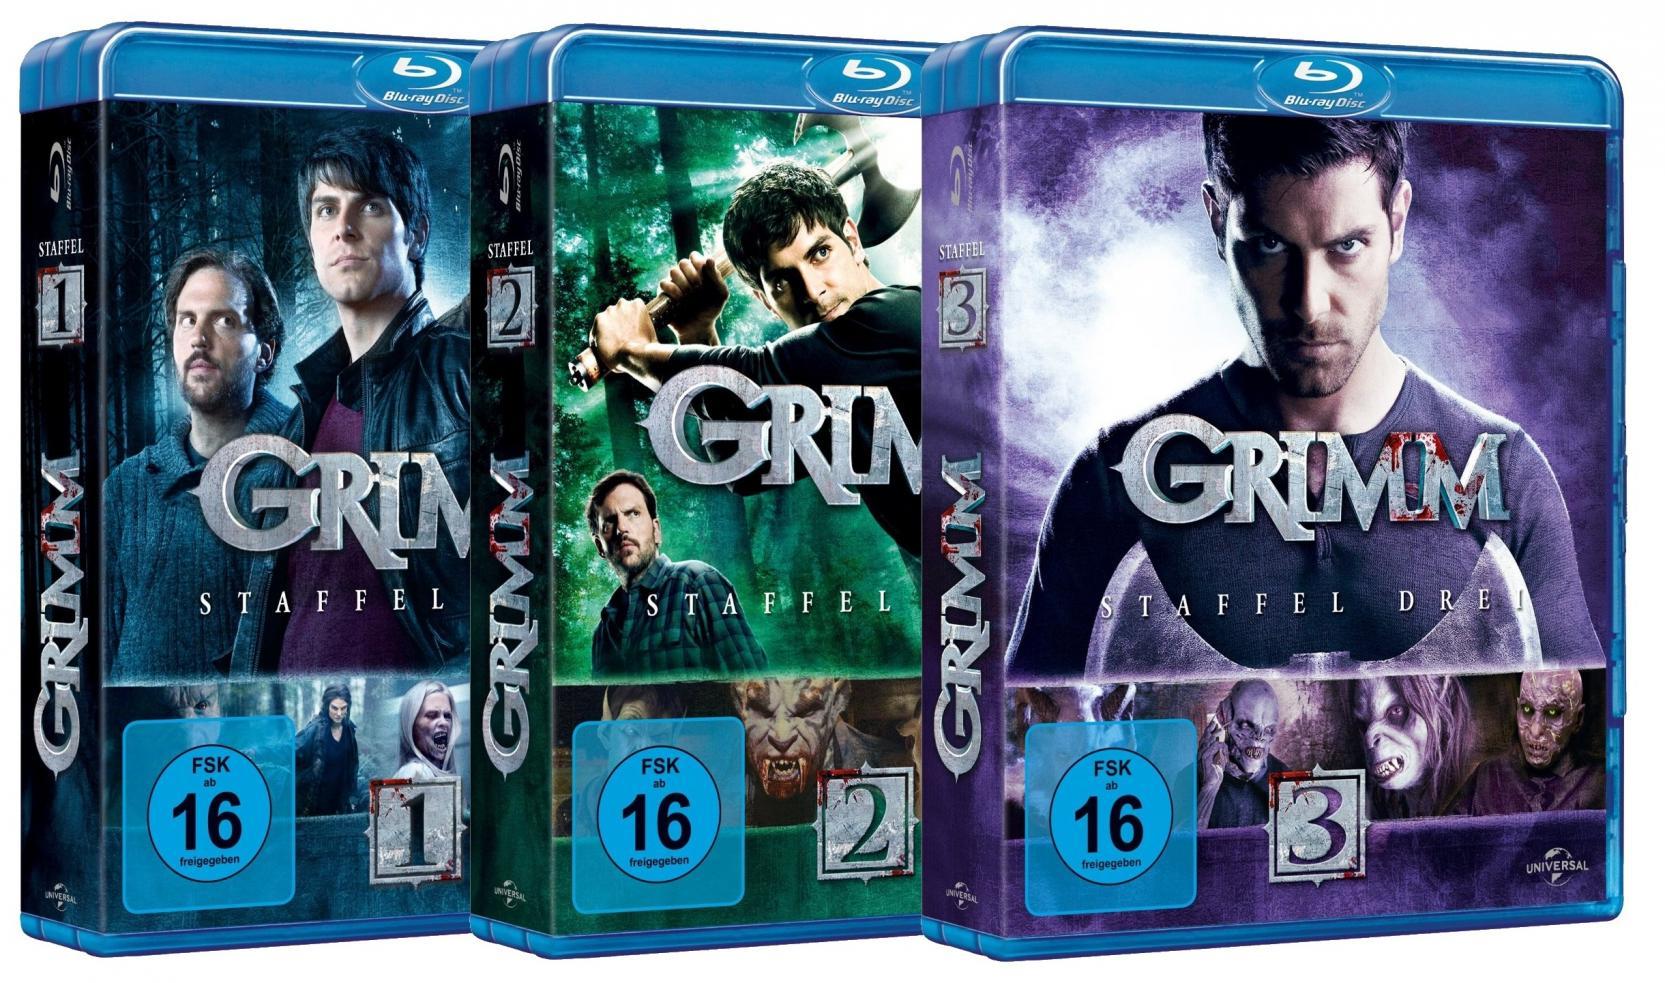 Grimm Staffel 1-3 Set (Blu-ray)